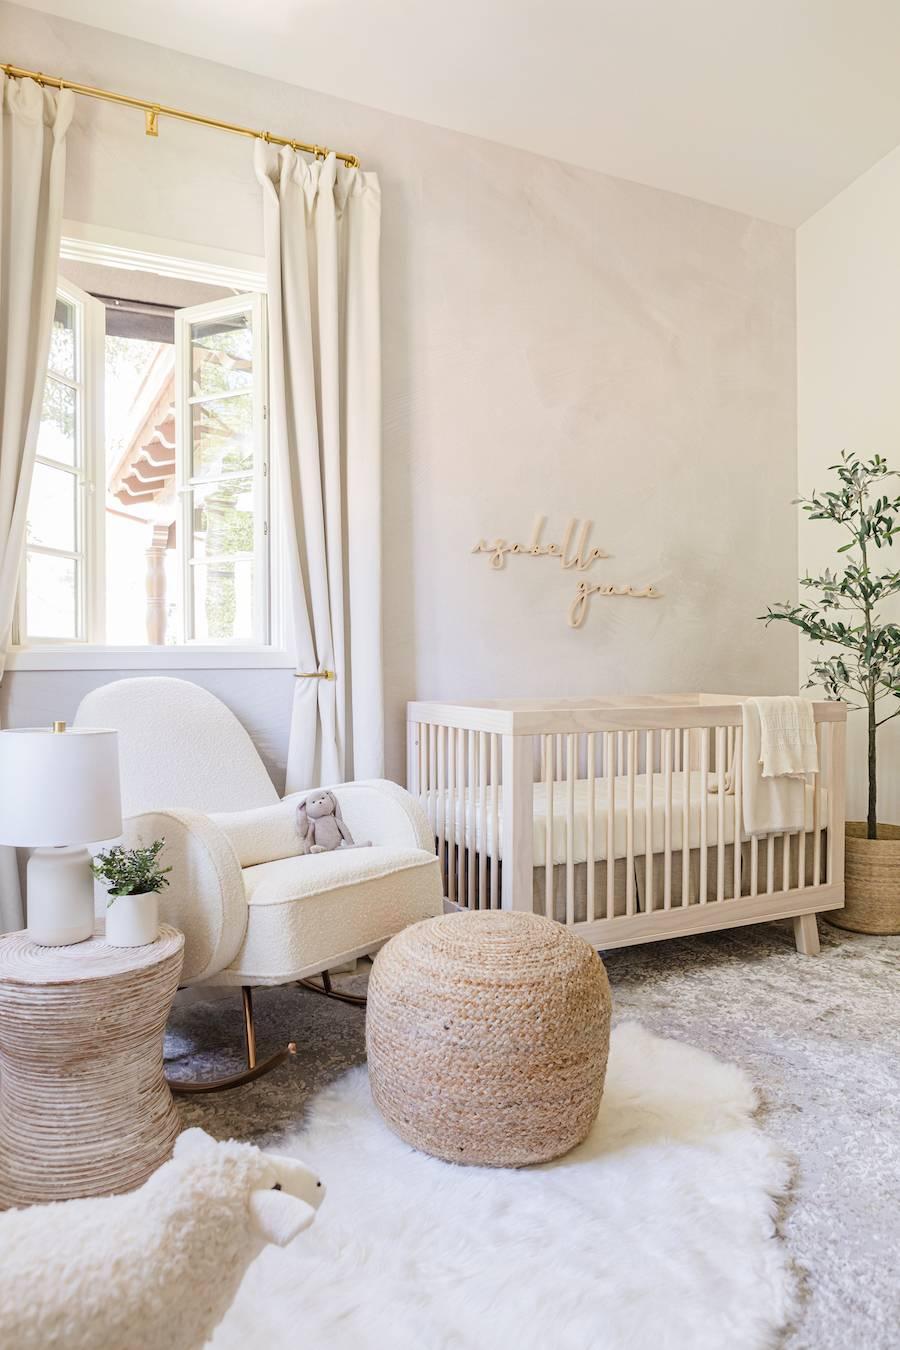 Natural & Neutral Nursery Design